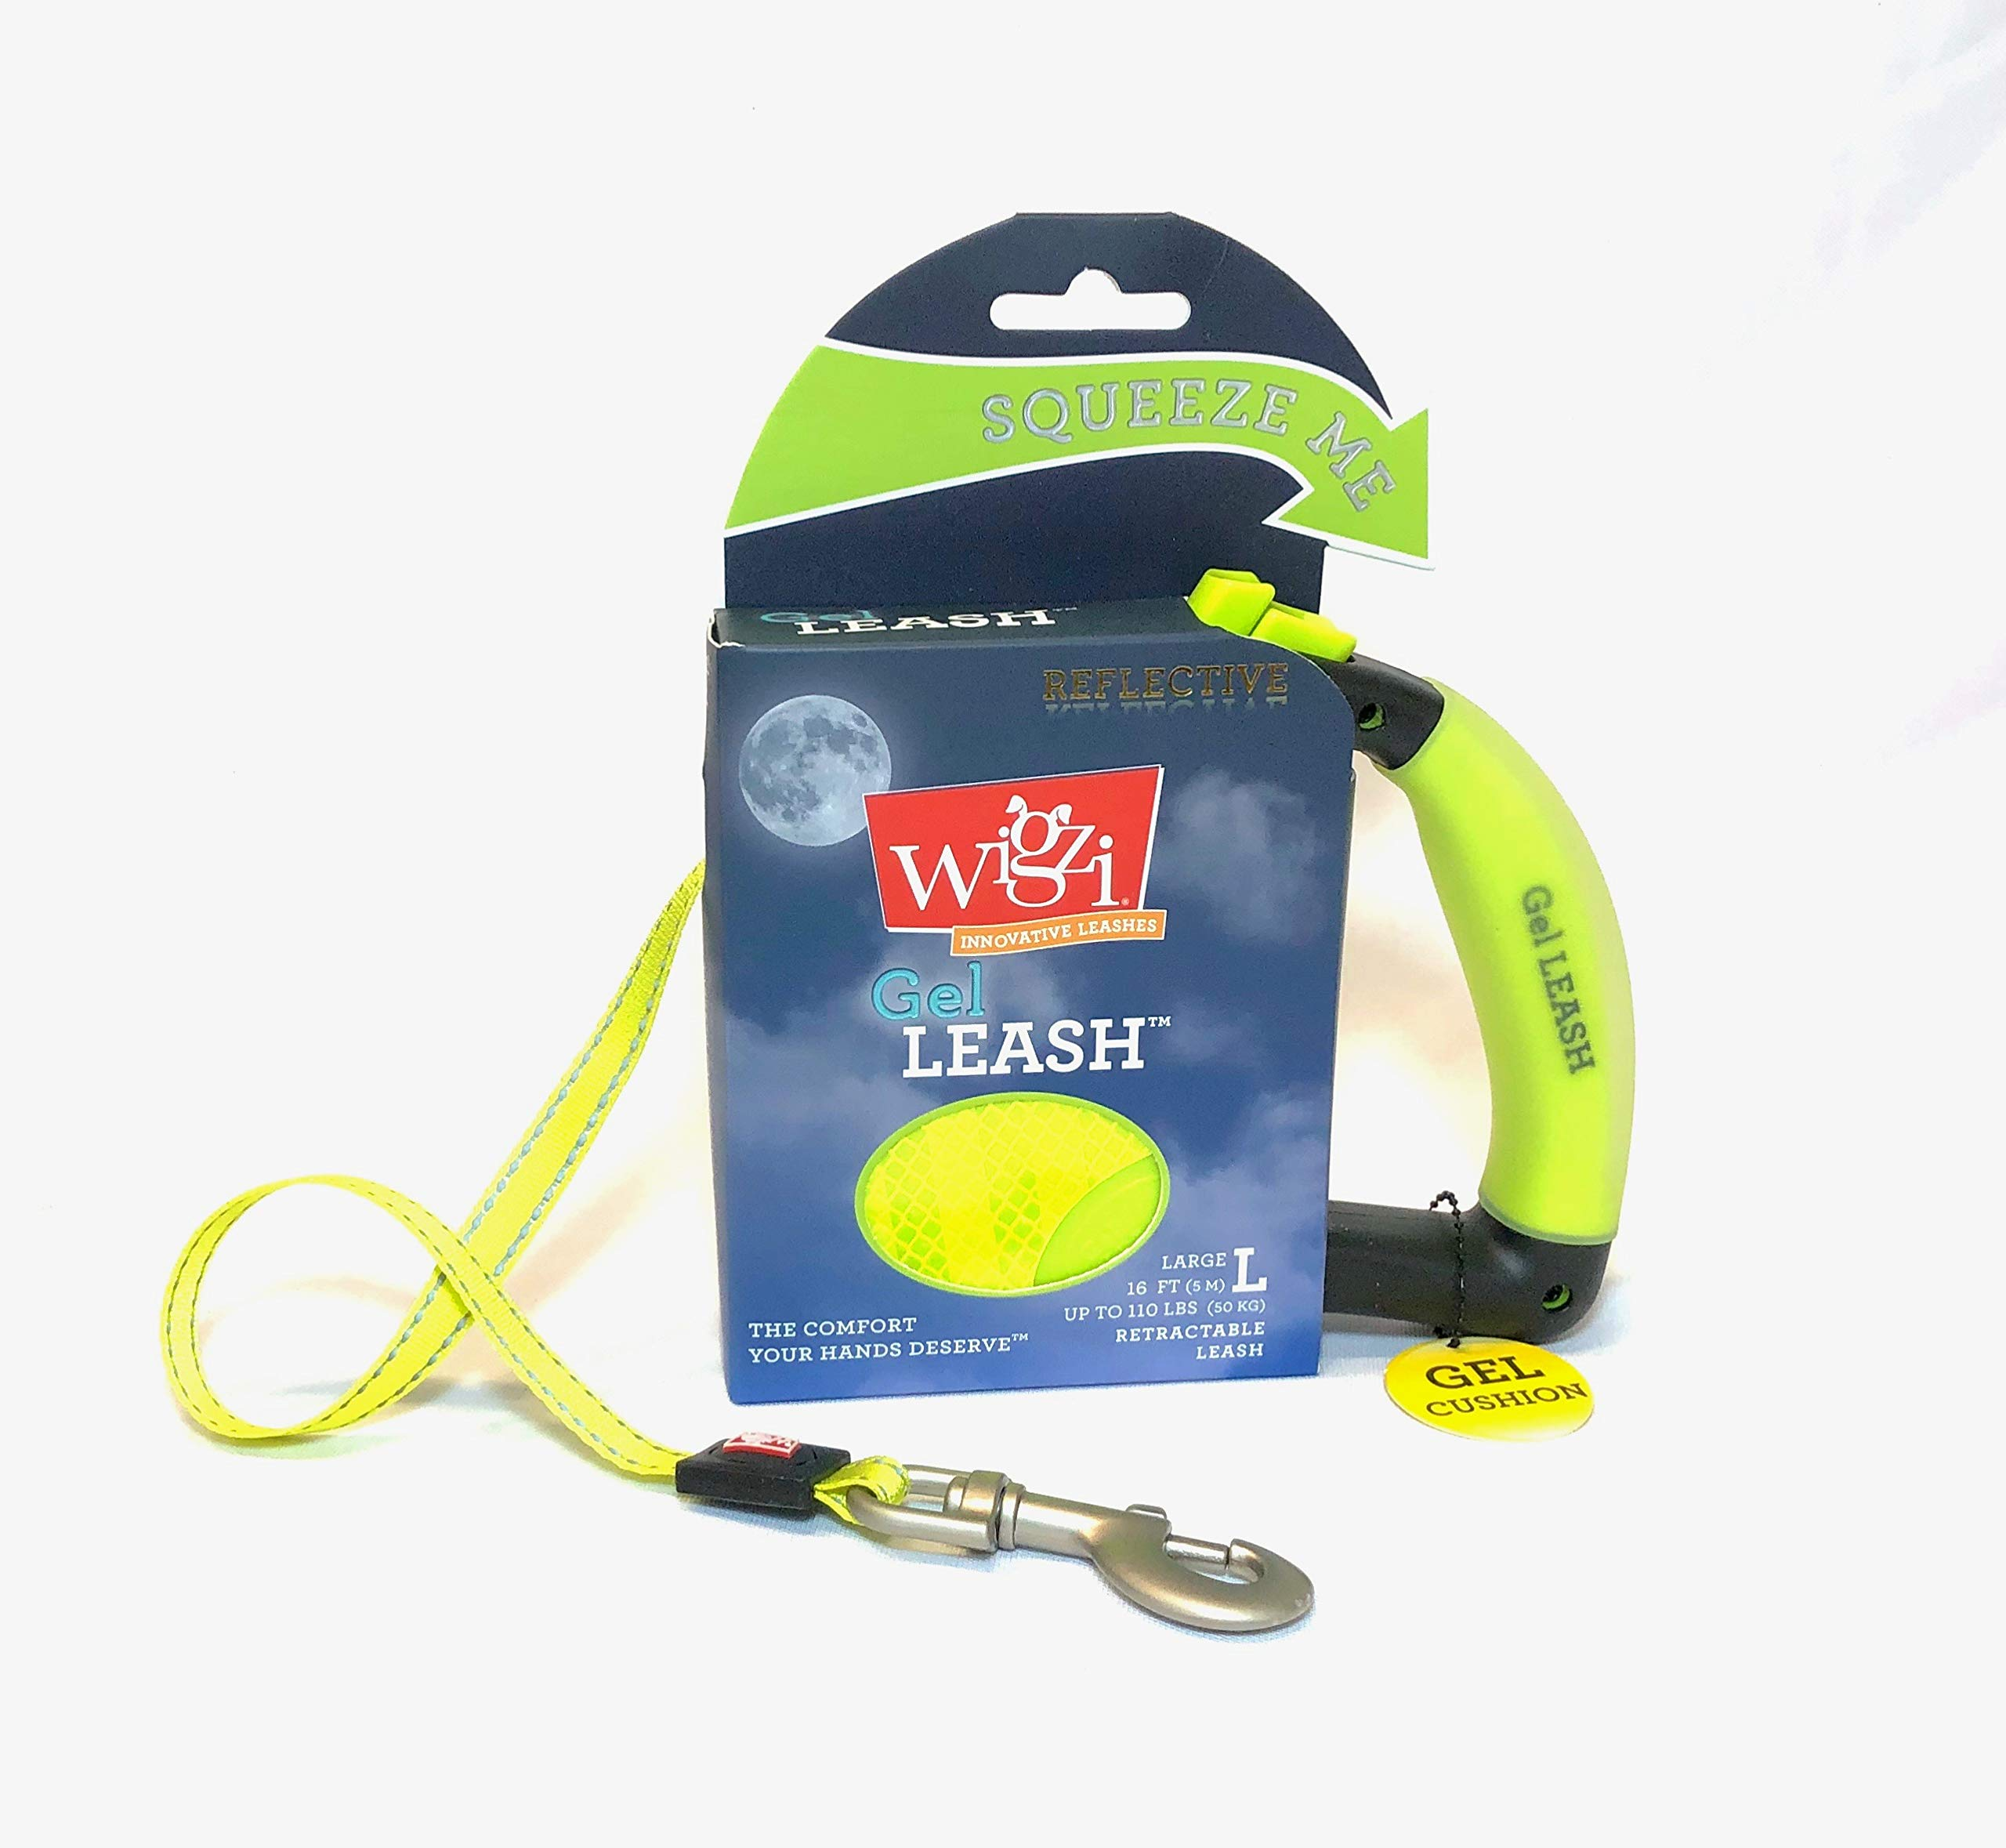 Wigzi Reflective Gel Retractable Leash, Yellow, Large by WIGZI (Image #4)